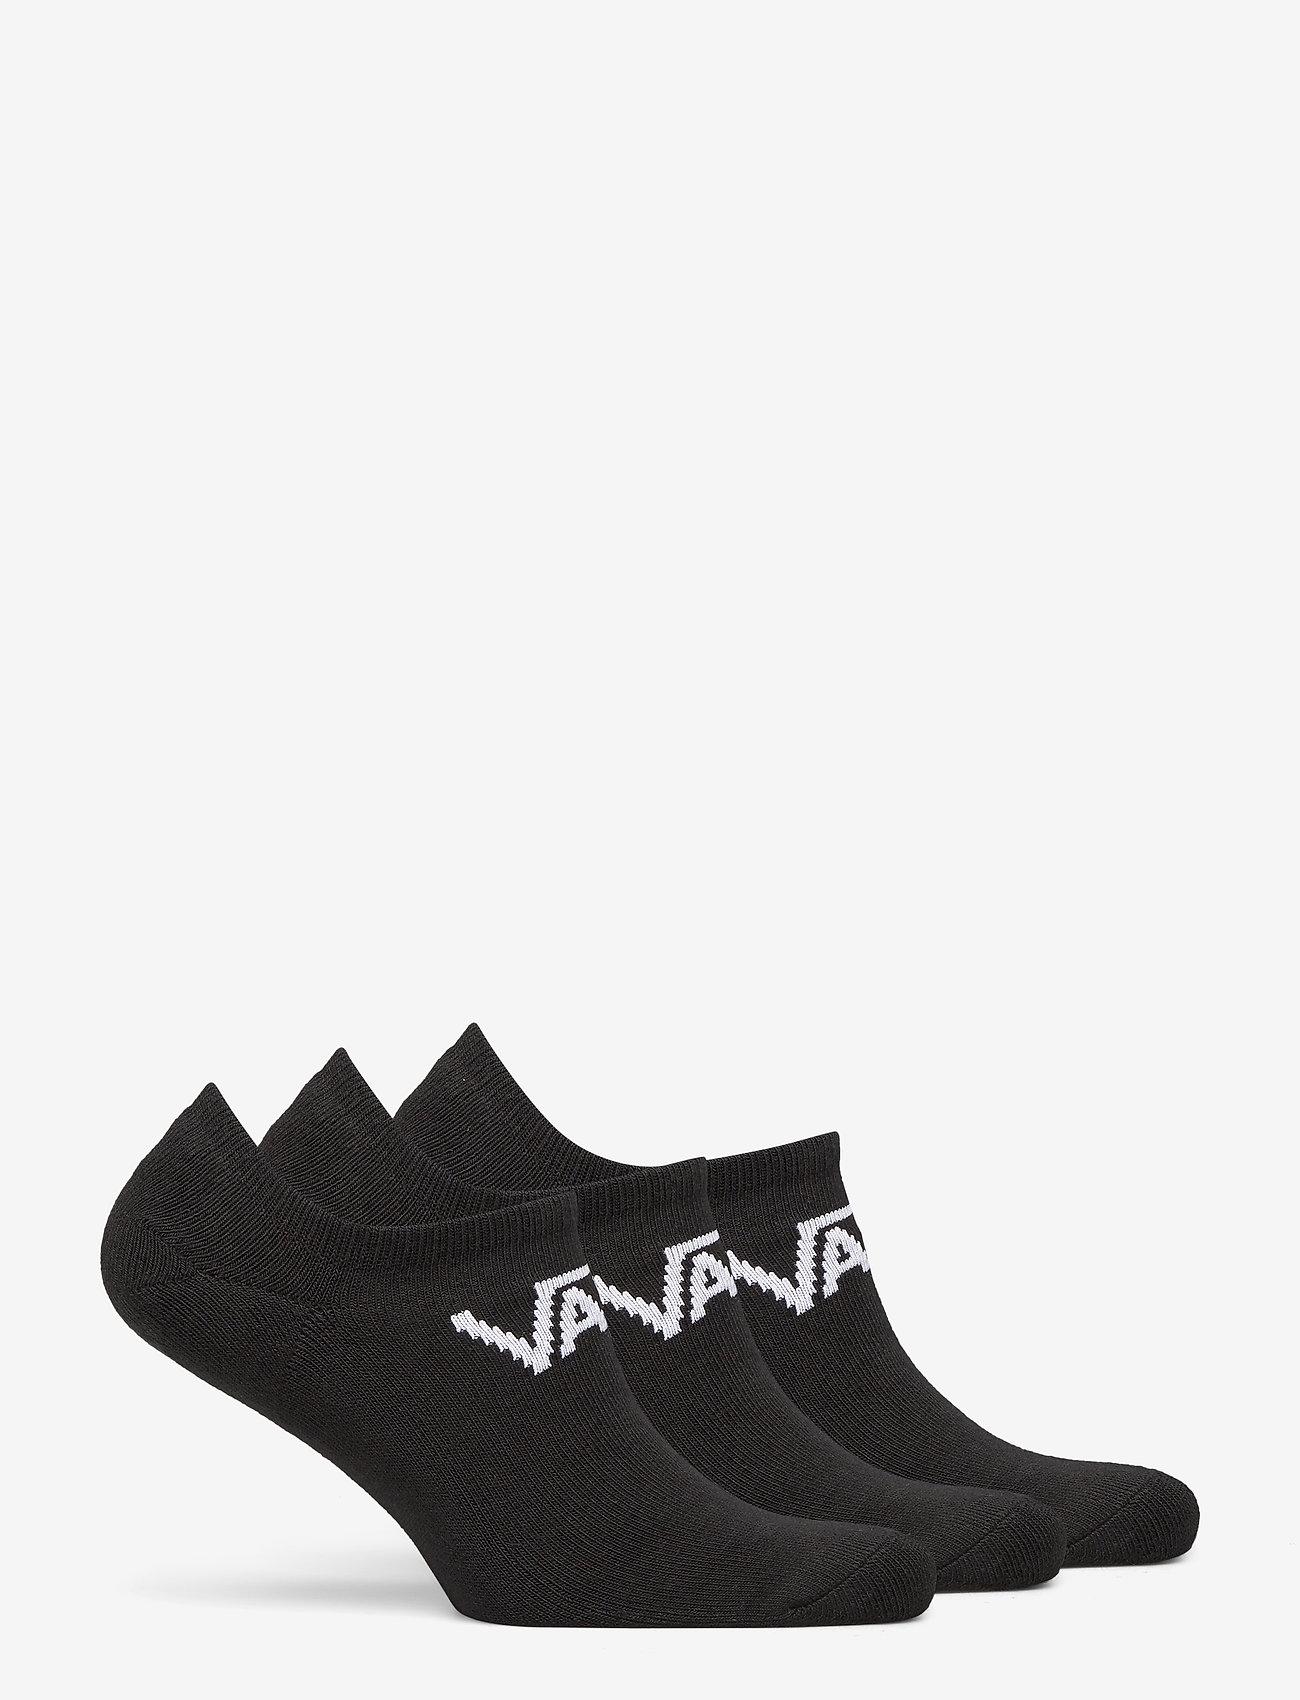 VANS - CLASSIC KICK (6.5-9, 3PK) - tennarisukat - black - 1